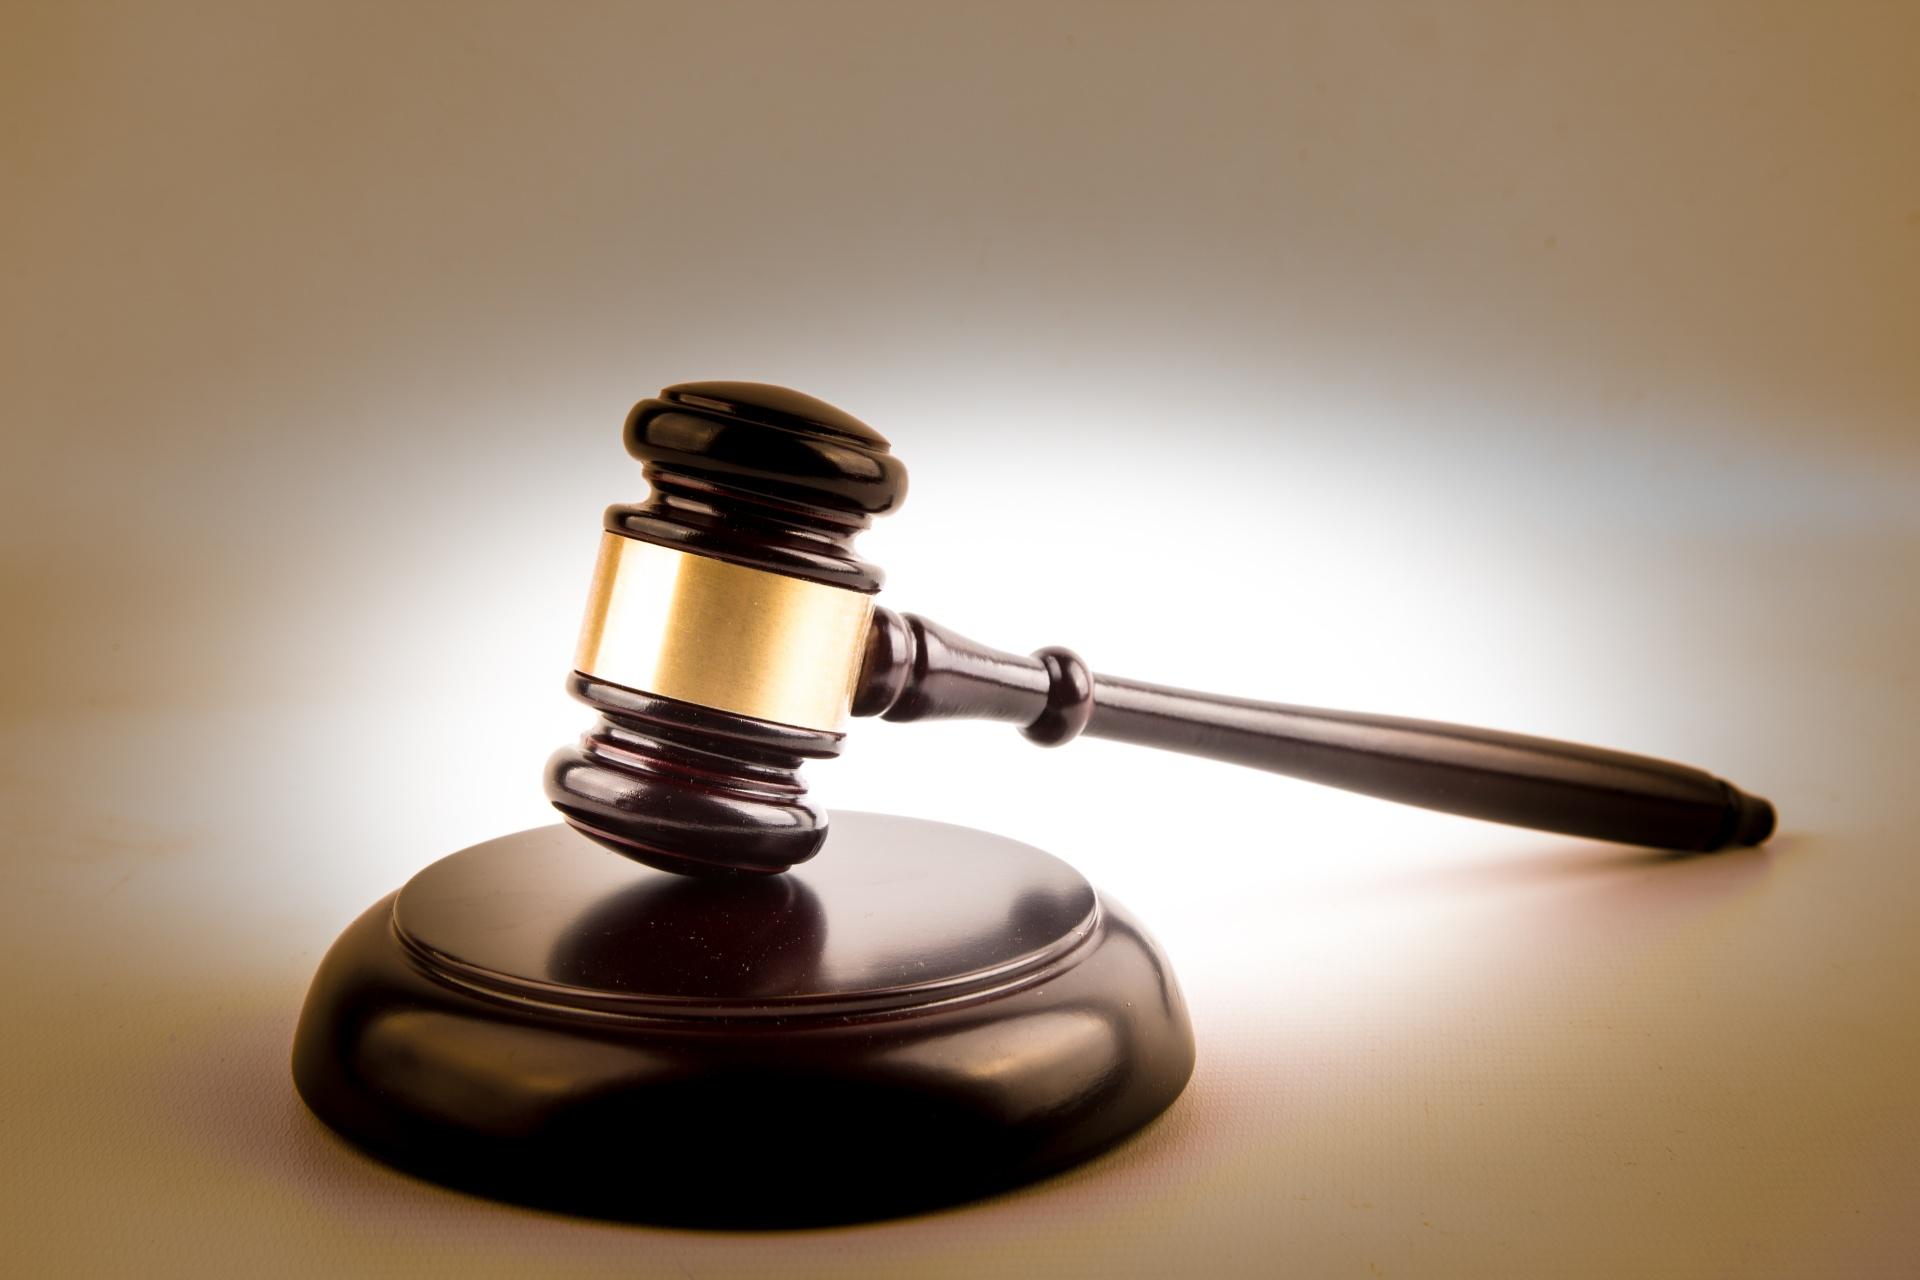 nassar s eaton county appeal denied wemu